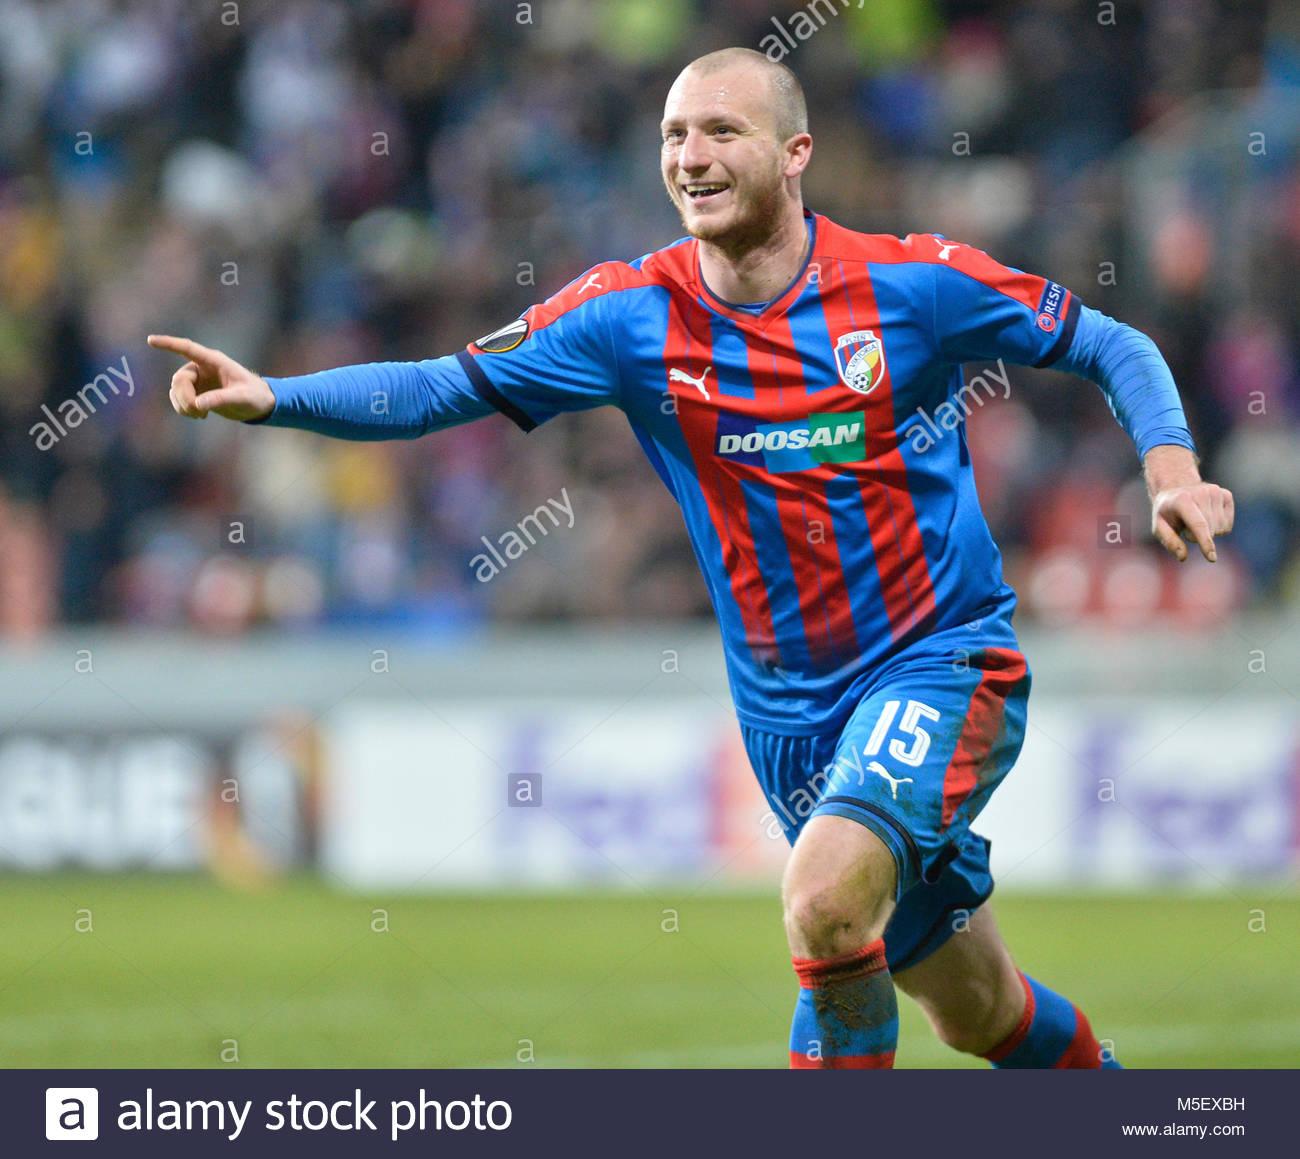 michael-krmencik-of-viktoria-celebrates-a-goal-during-the-europa-football-M5EXBH.jpg